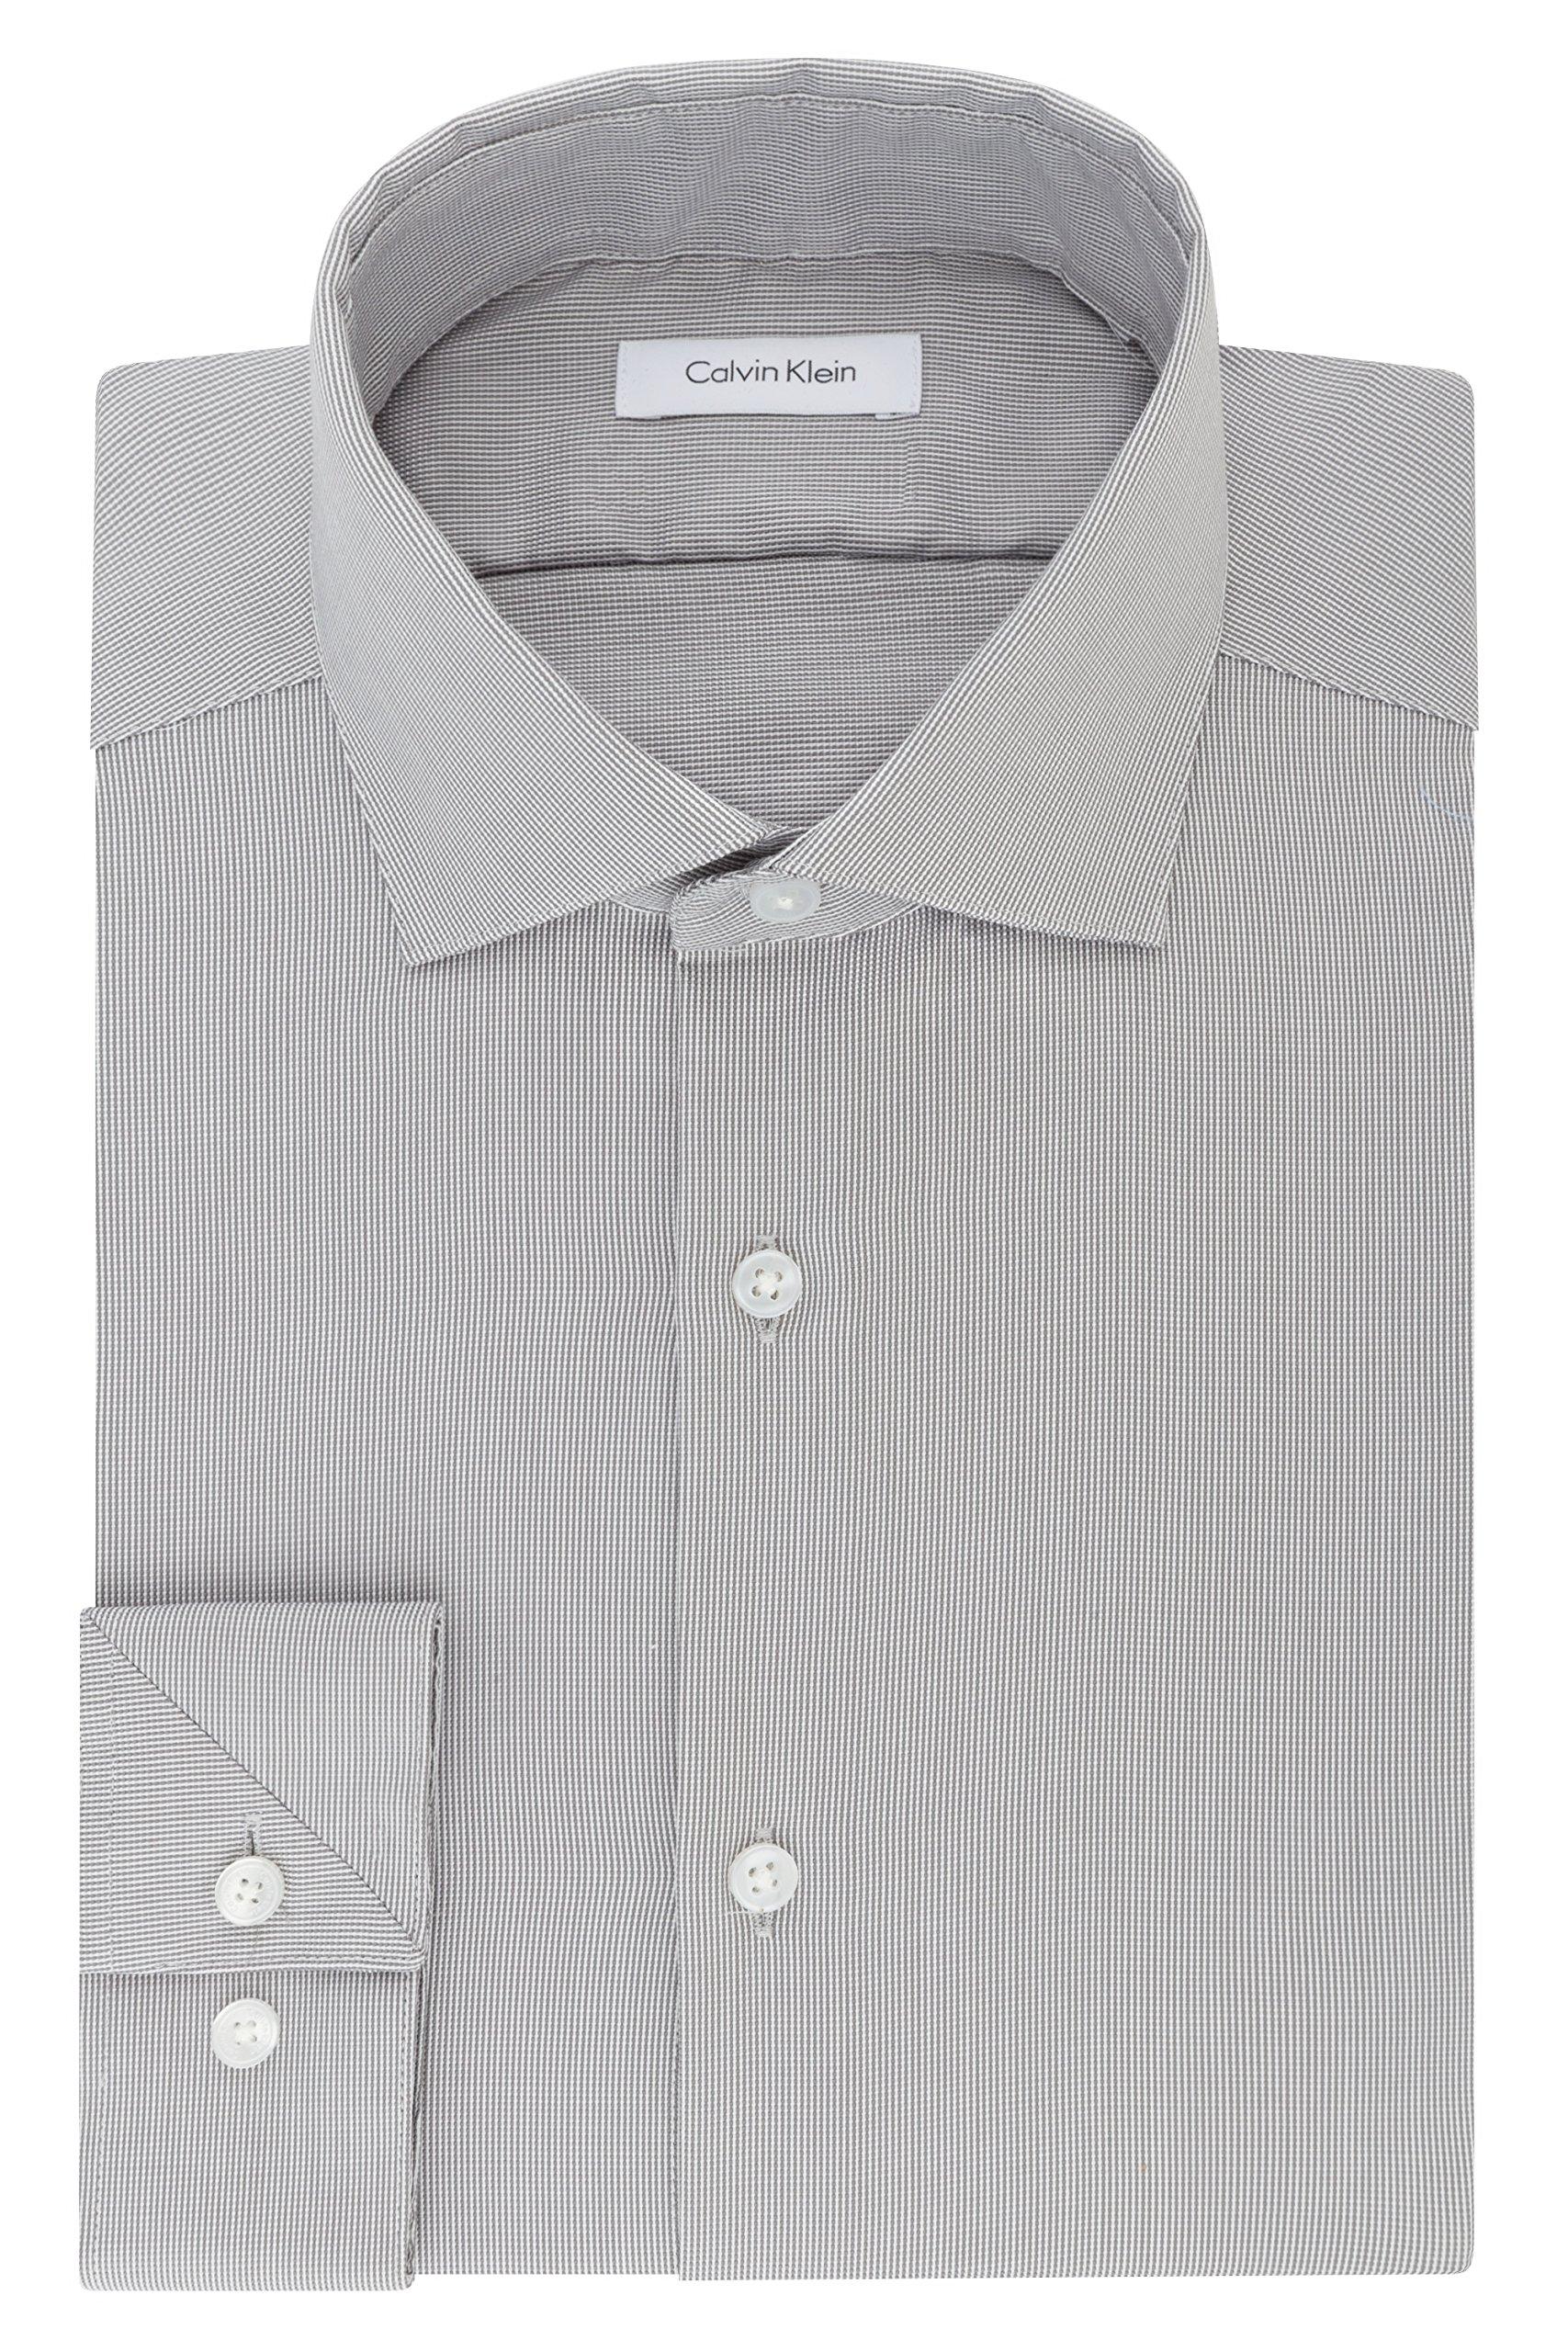 Calvin Klein Men's Non Iron Stretch Slim Fit Unsolid Solid Dress Shirt, Smokey Grey, 16'' Neck 32''-33'' Sleeve